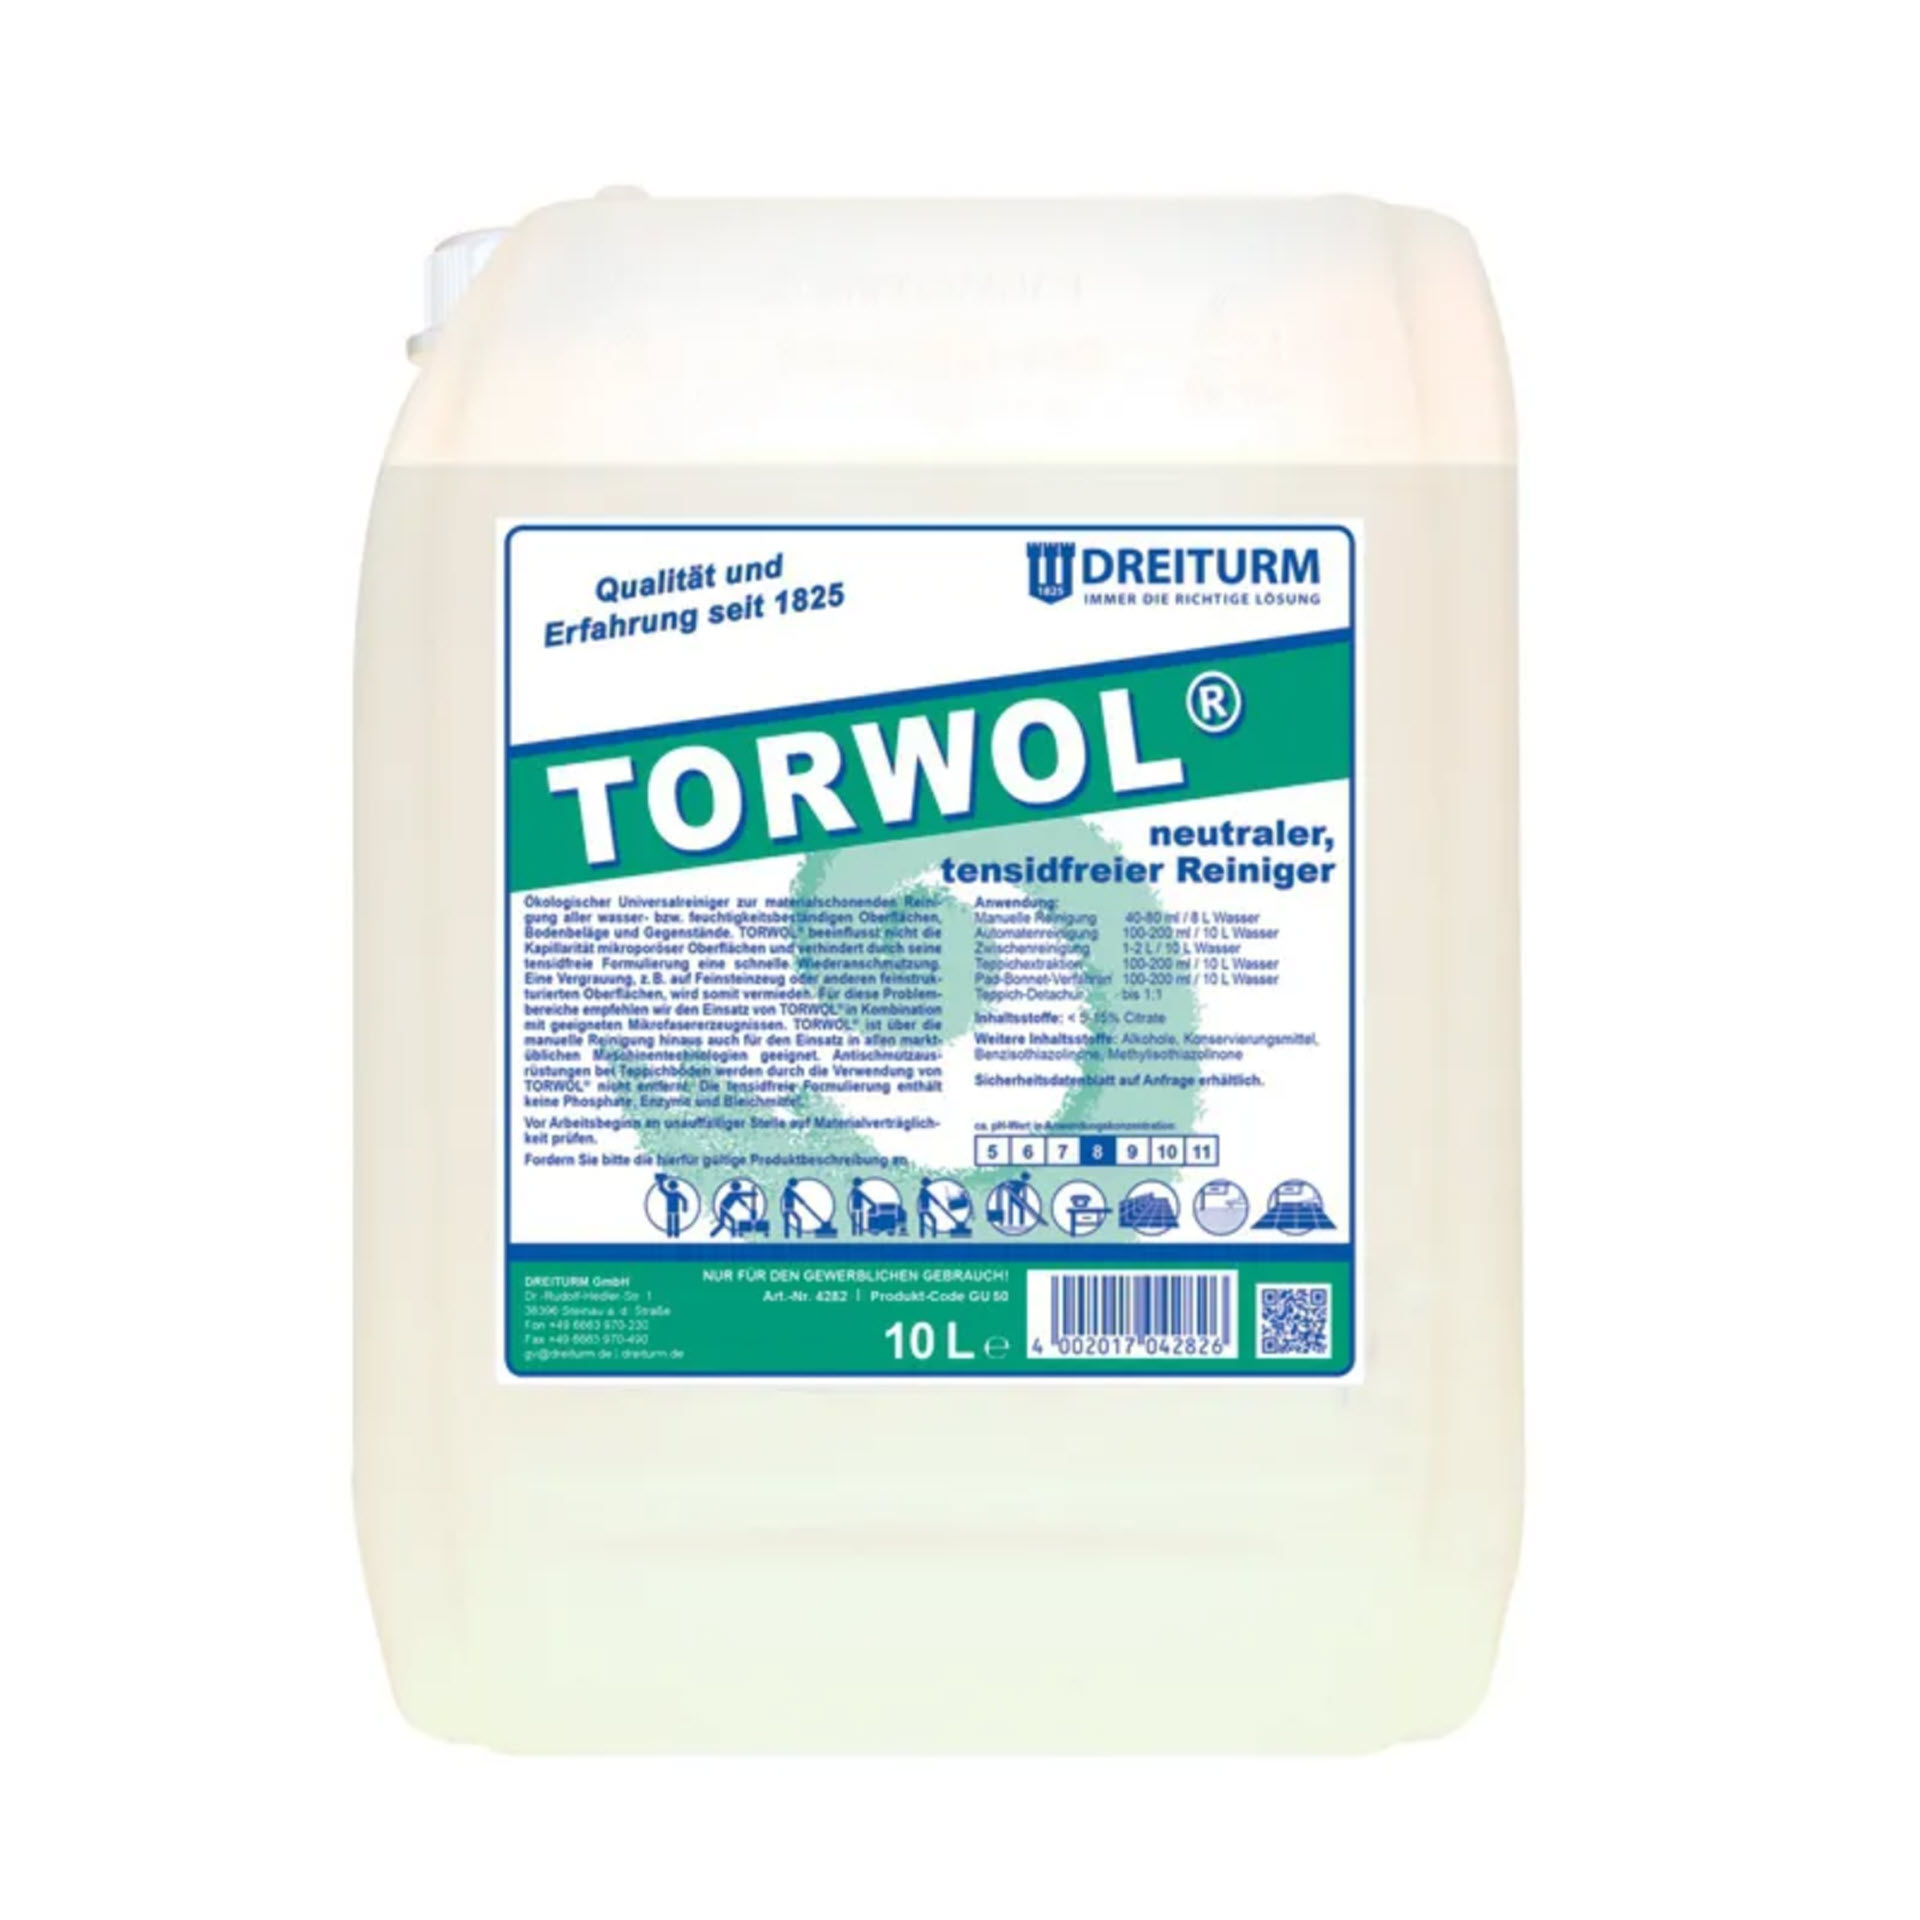 Dreiturm TORWOL®  tensidfreier Universalreiniger - 10 Liter Kanister